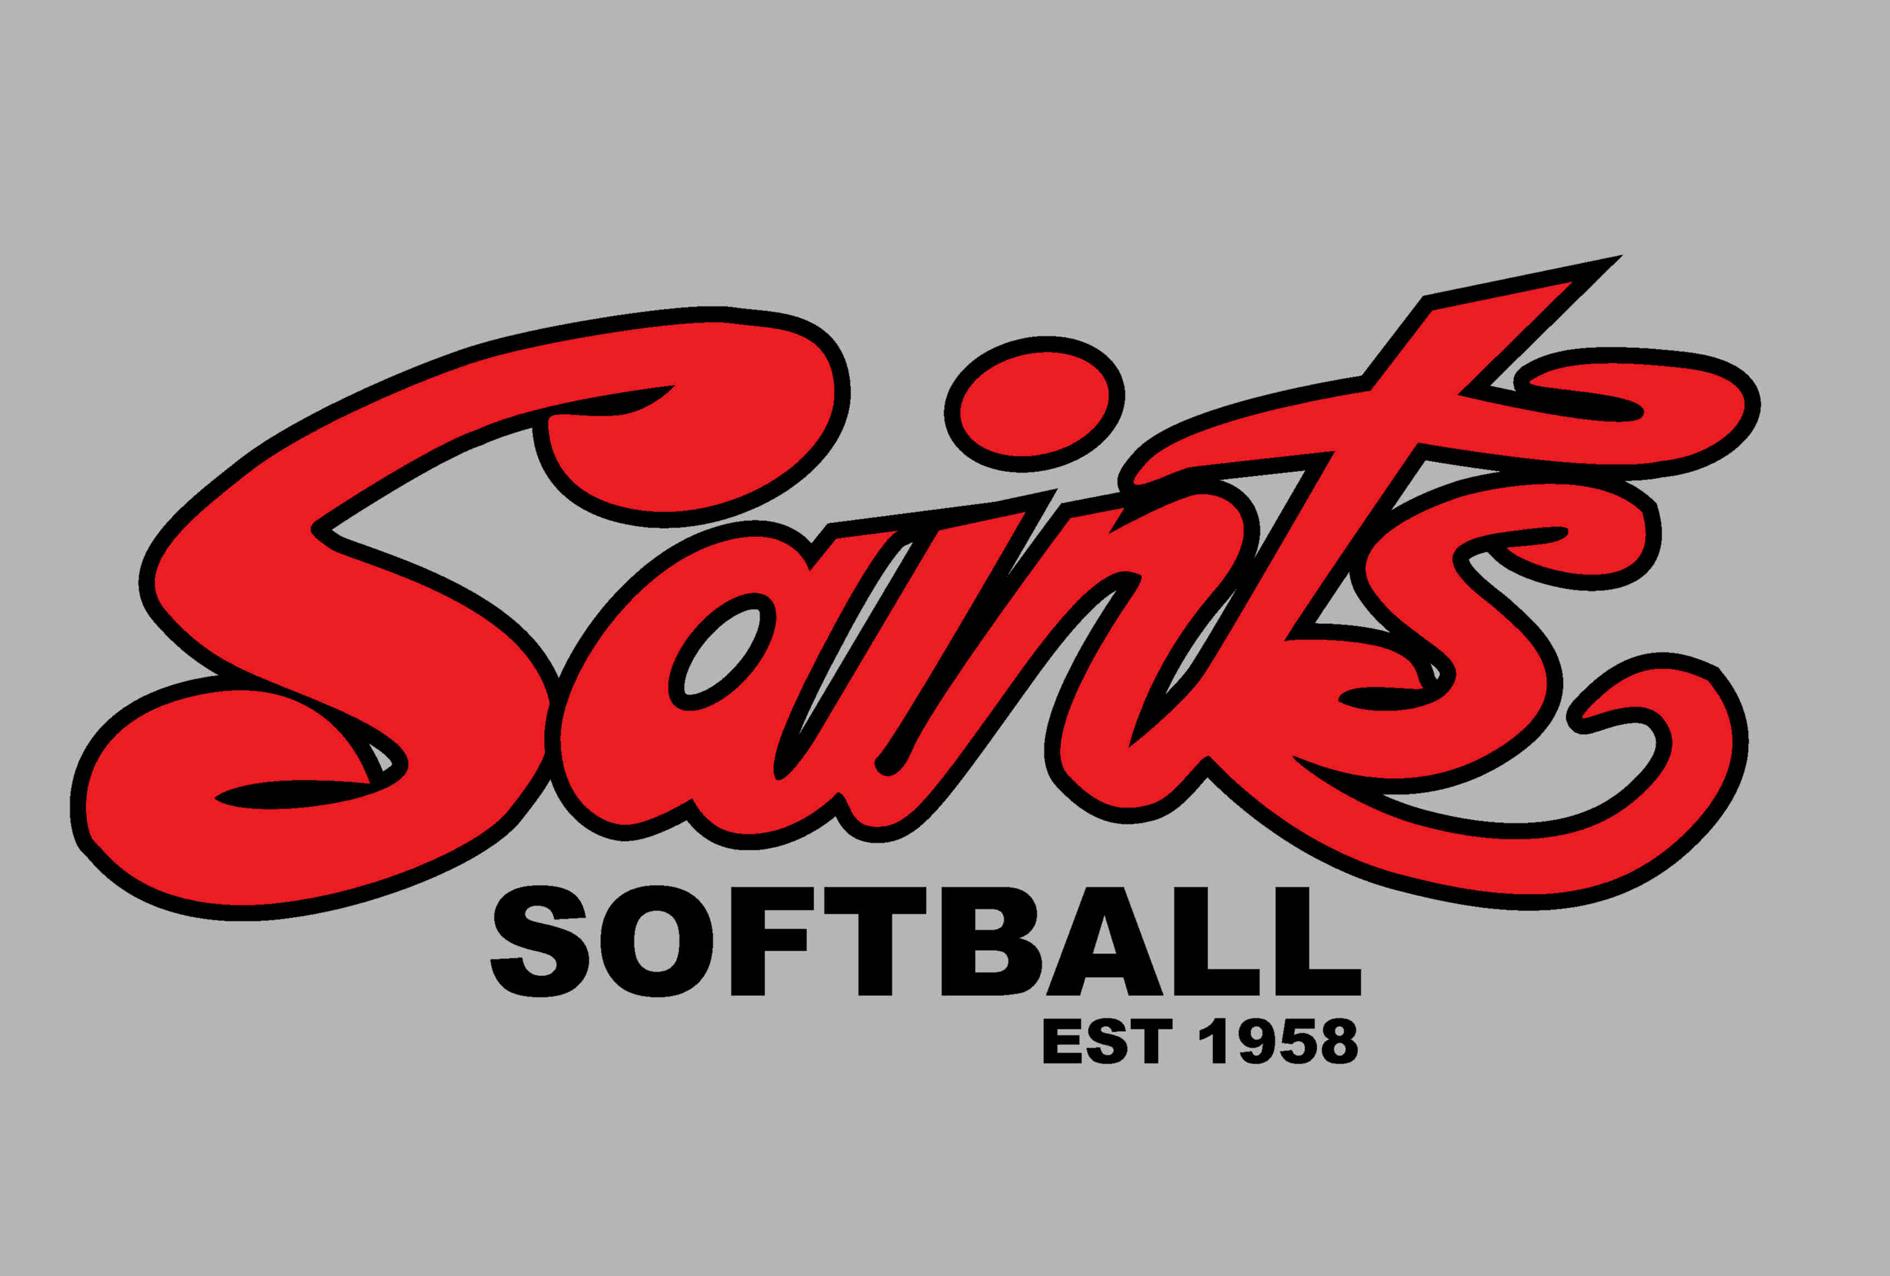 Hutt Valley Saints Softball Club